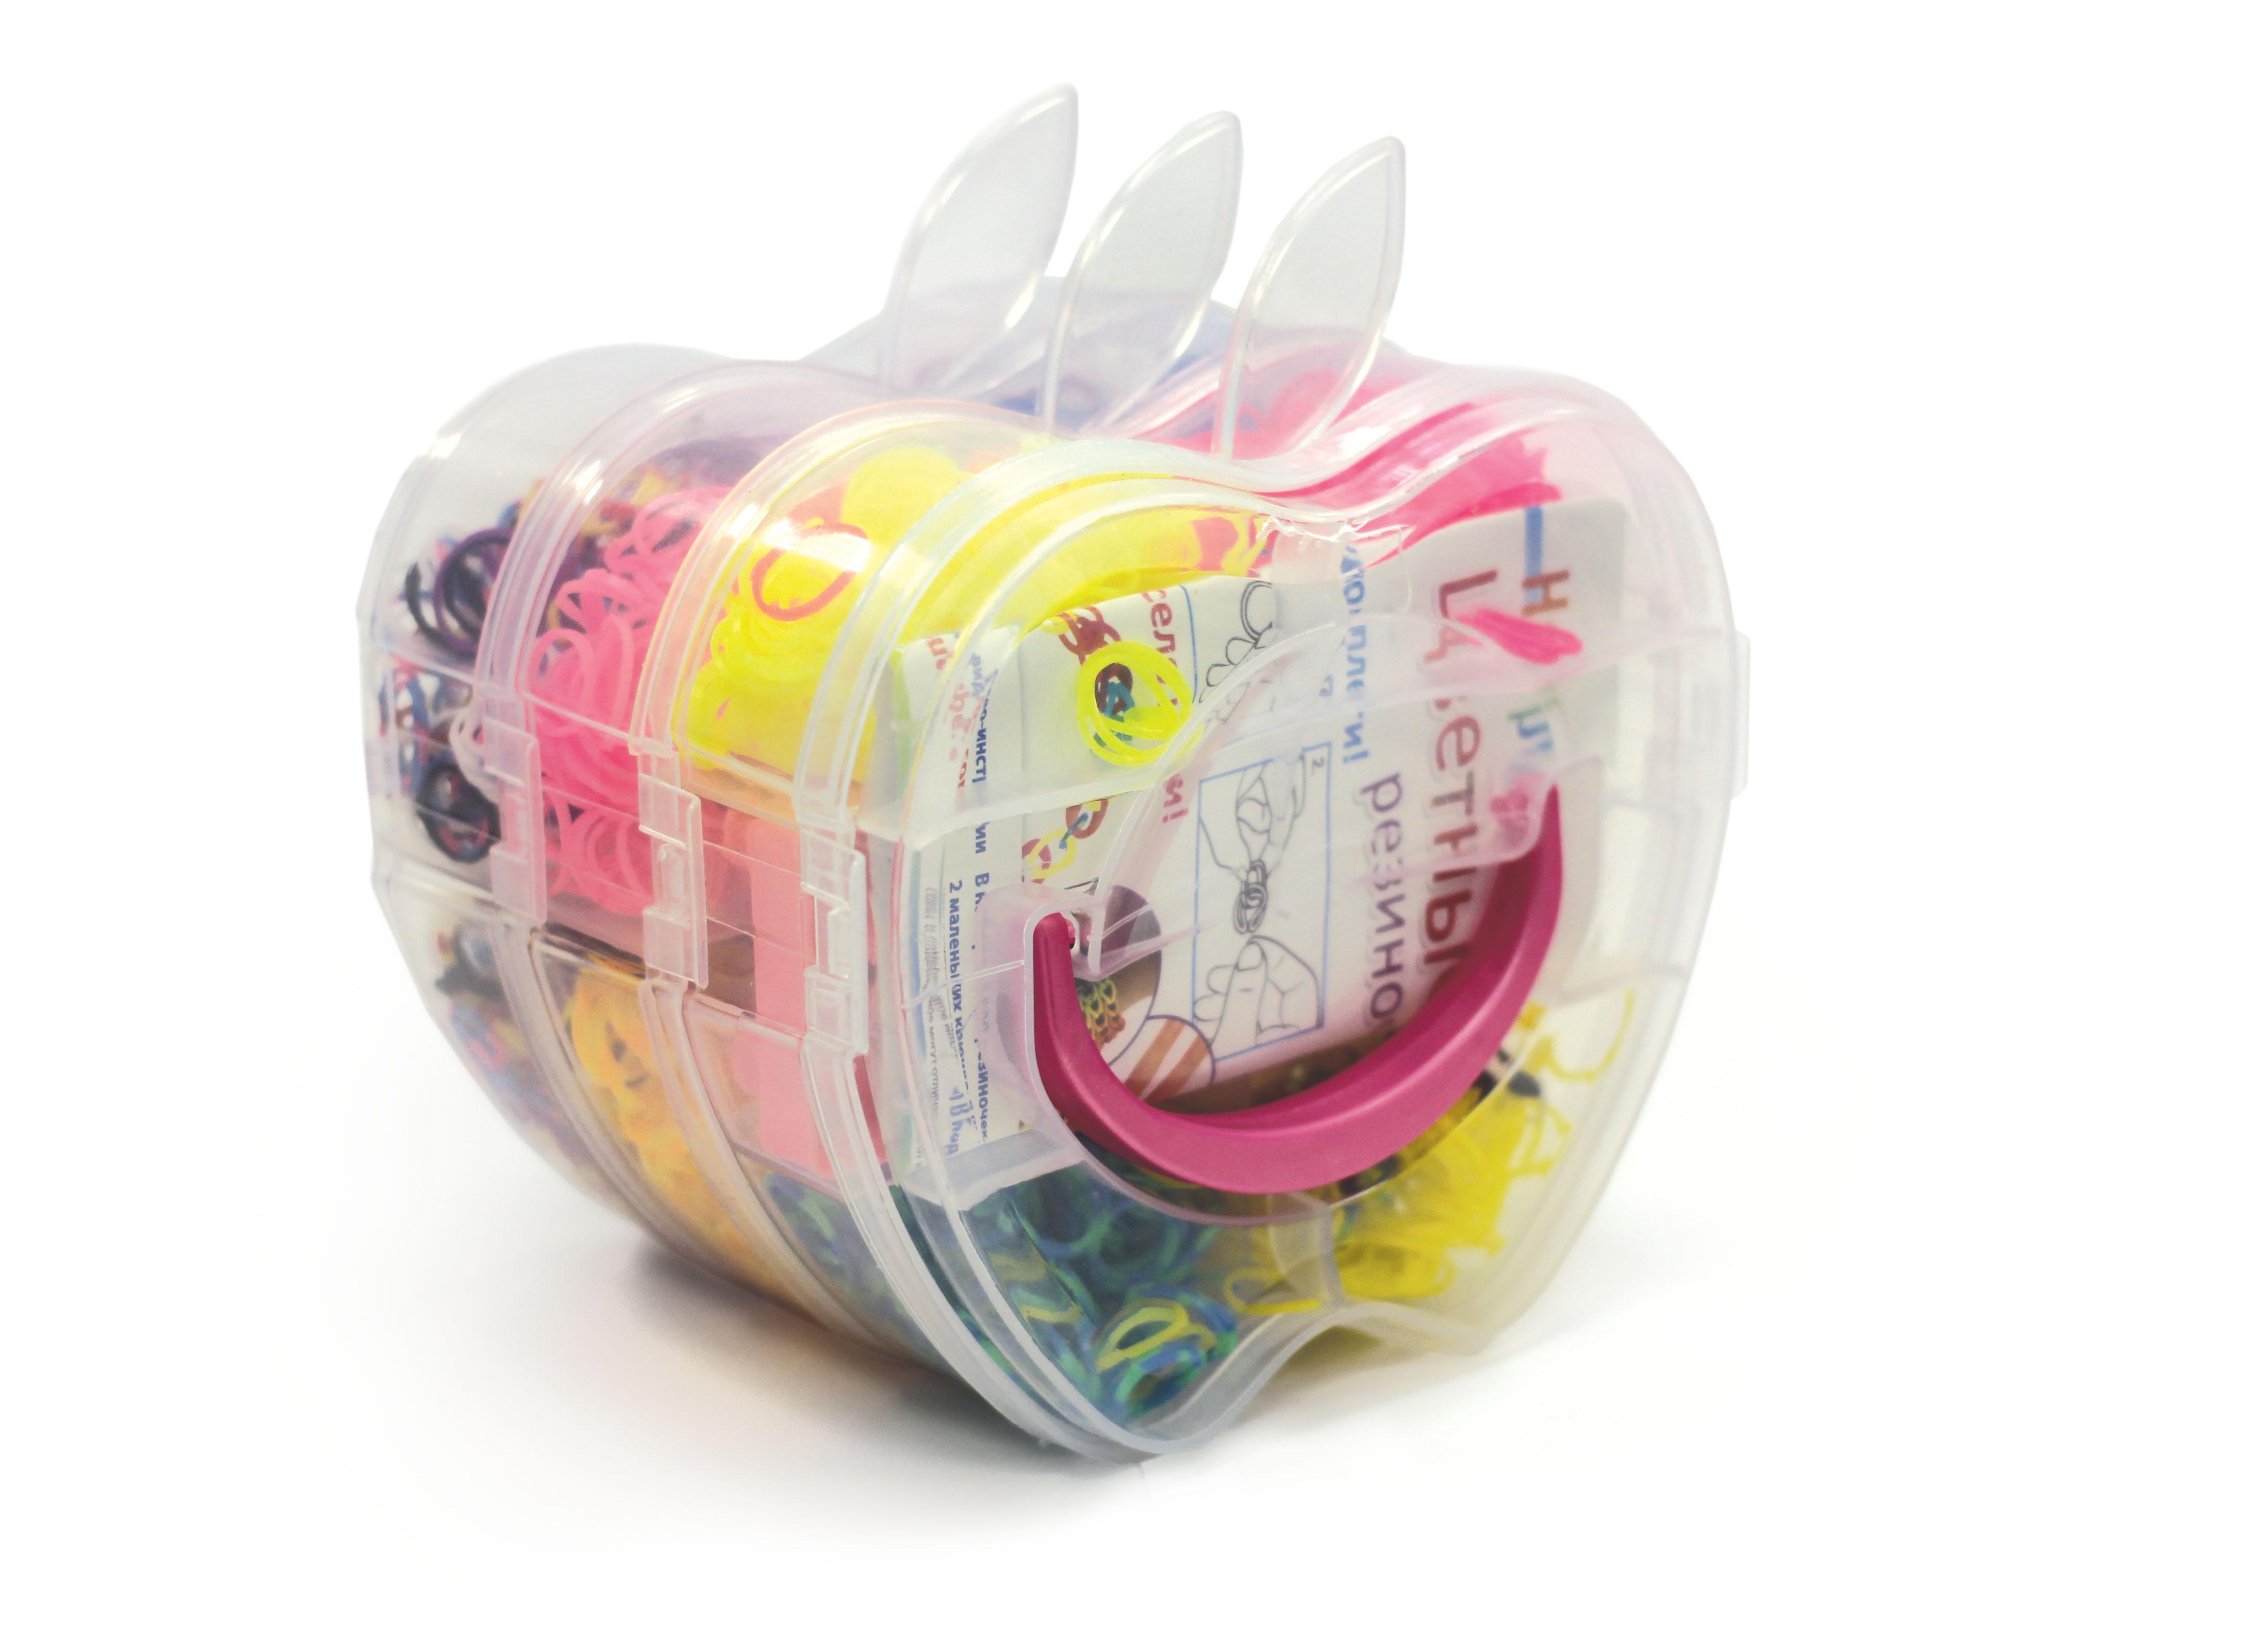 Happy Loom.Цветные резиночки. Набор Яблоко в чемодане: 2800 рез., станок д\плетения, 2 крючка, зам-ки, подвески, инструкция. арт. 01784